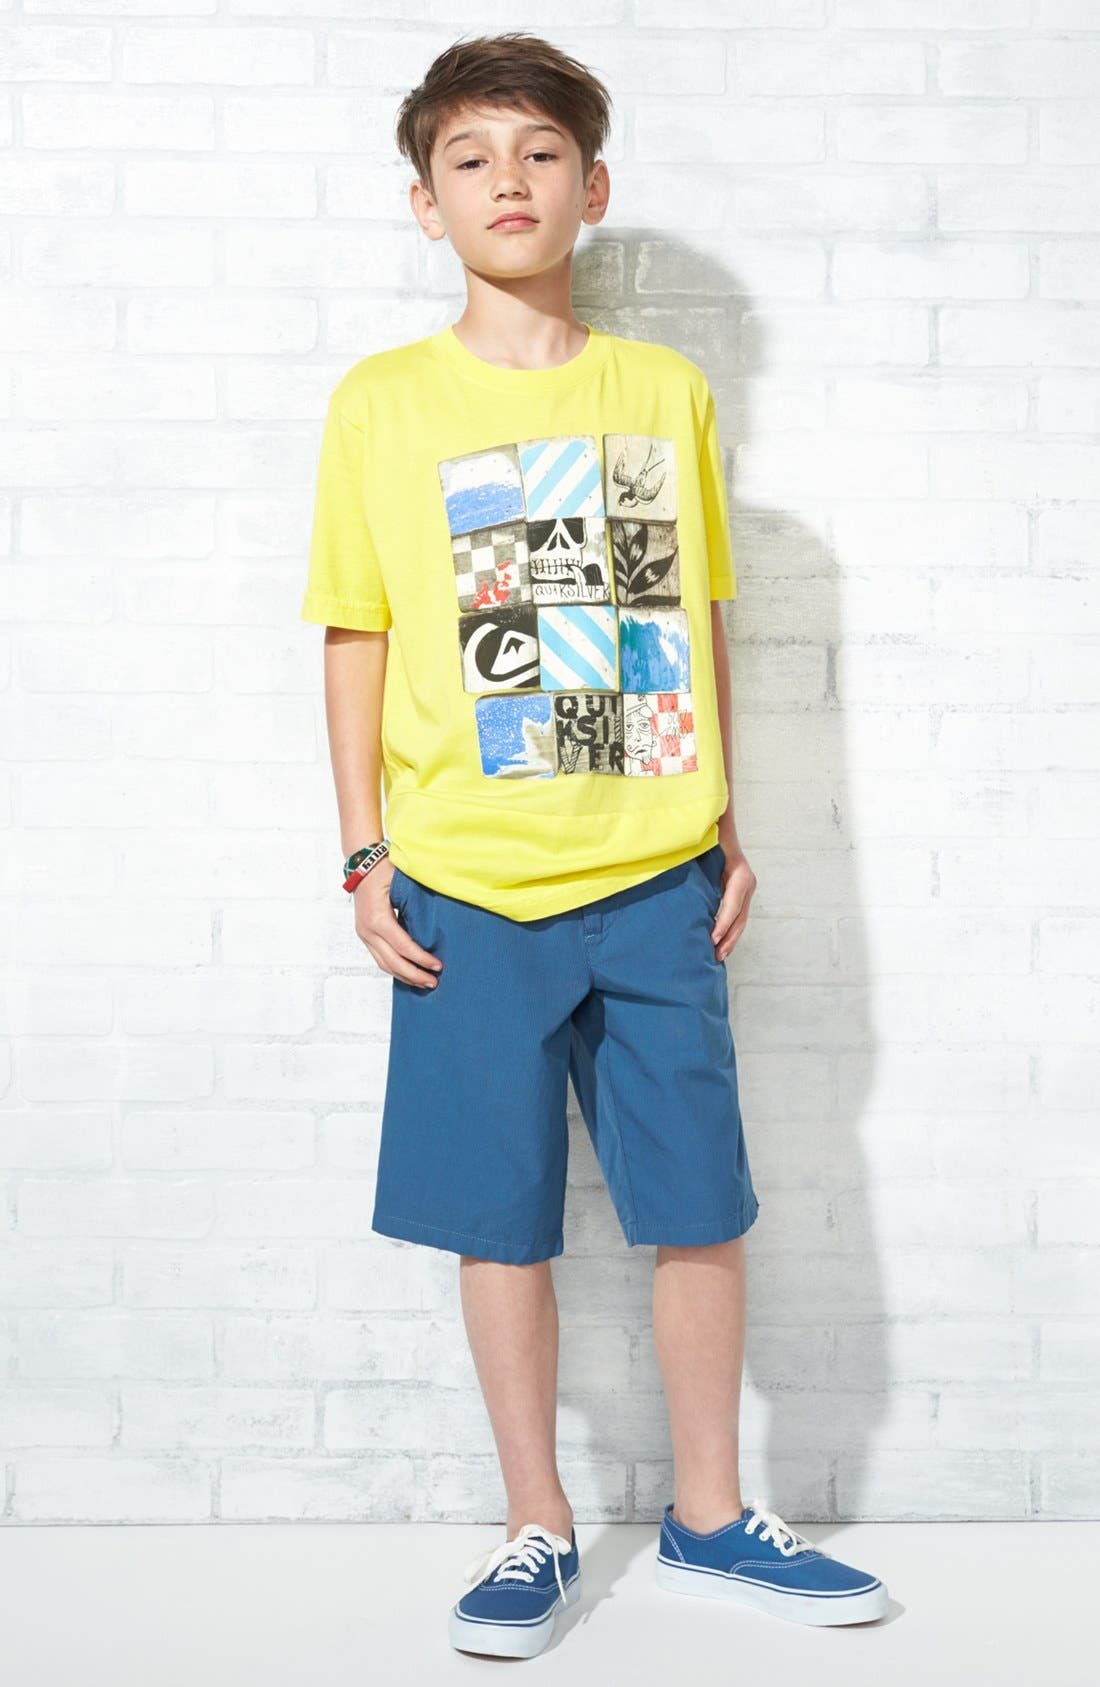 Main Image - Quiksilver T-Shirt & Shorts (Big Boys)